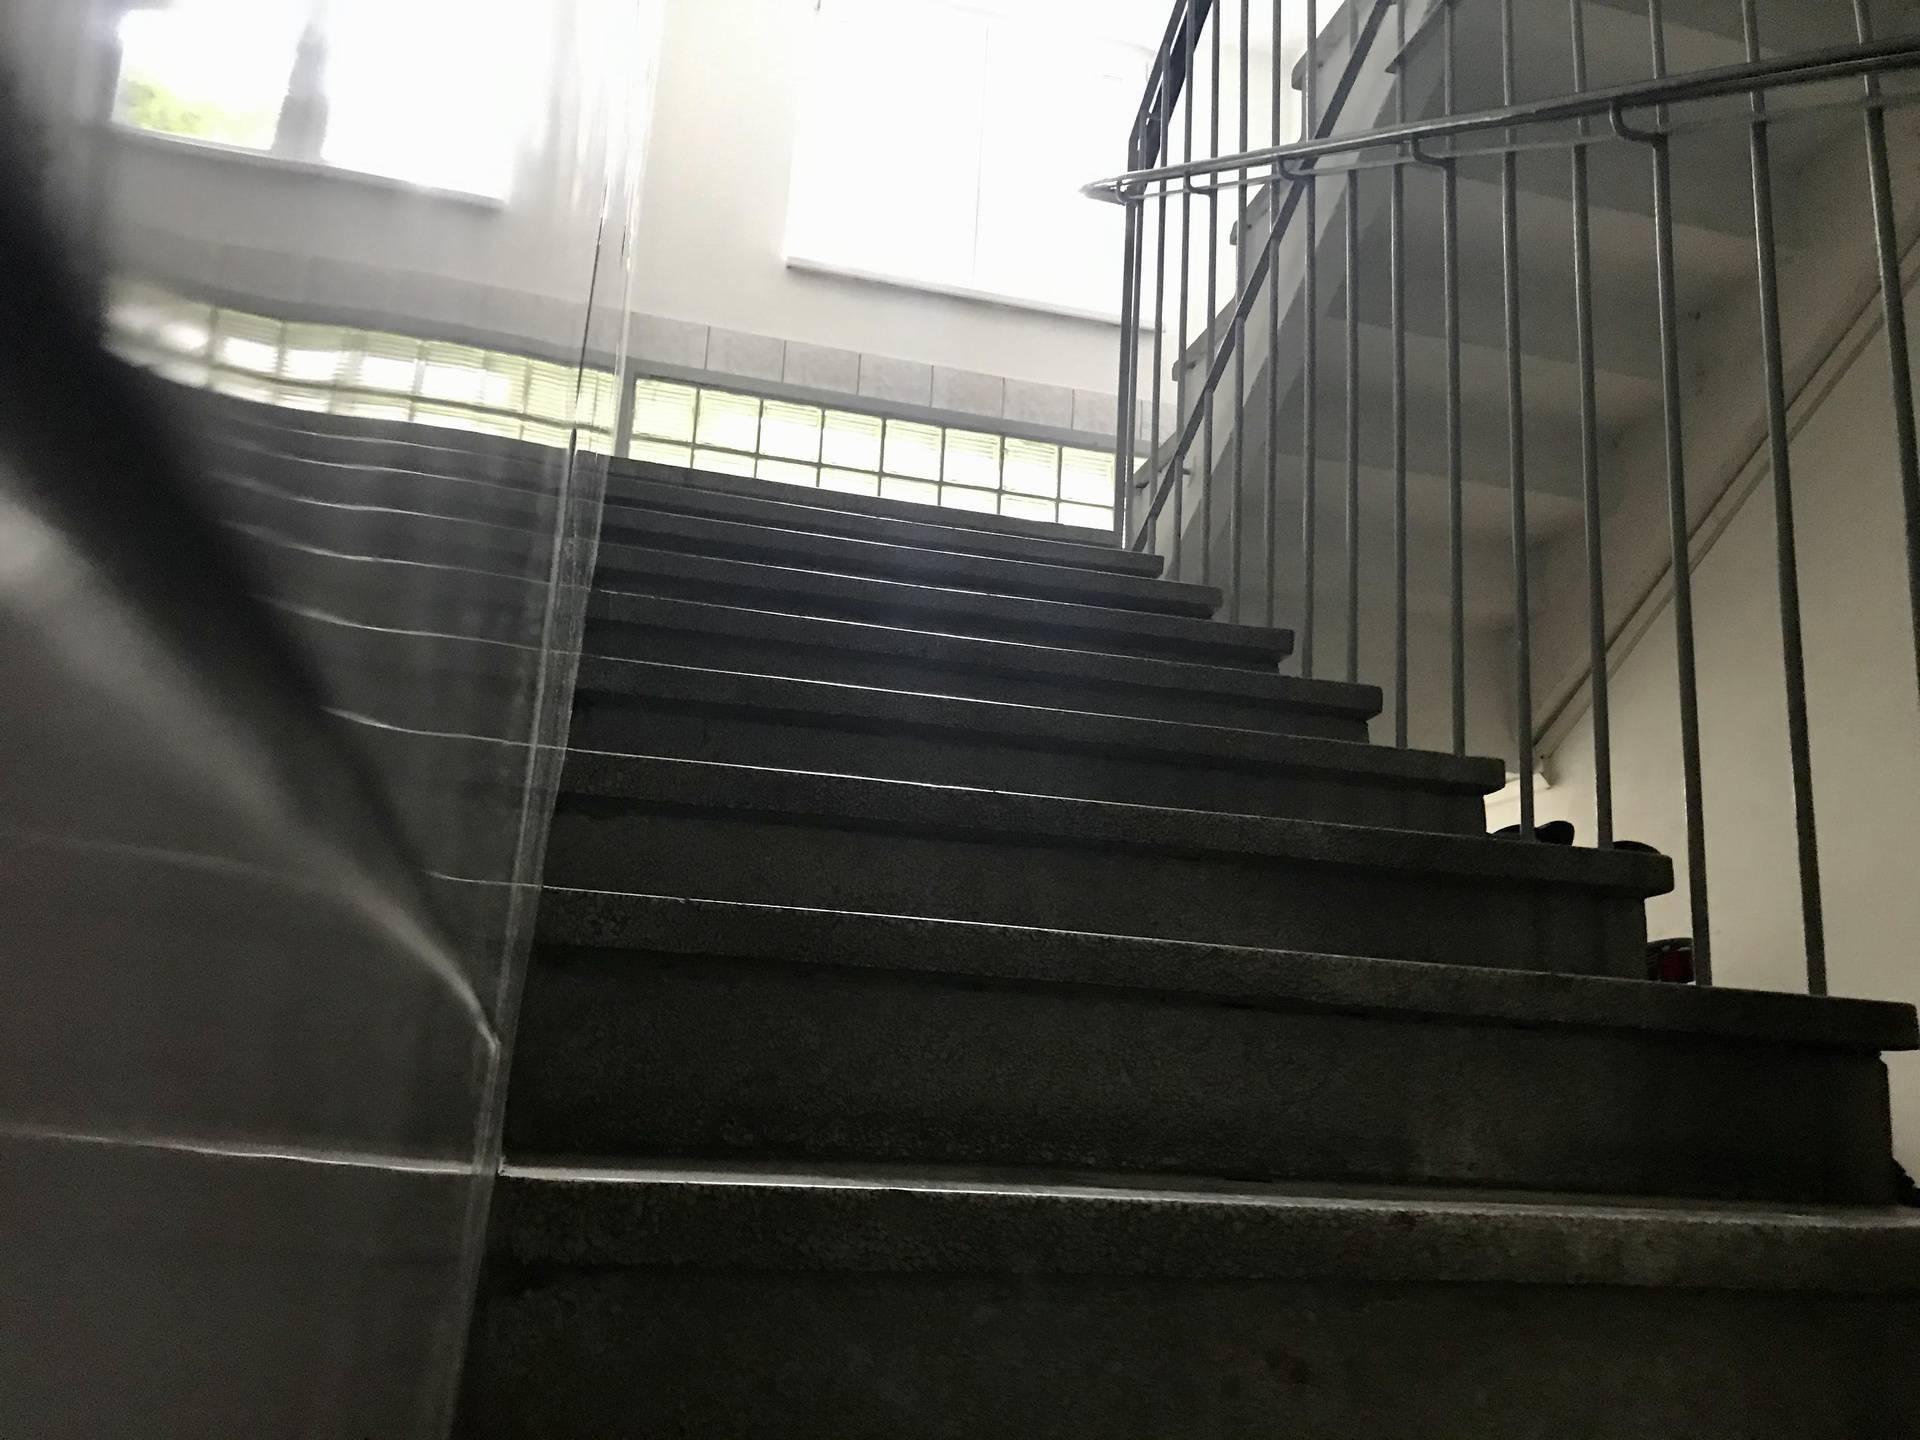 Svaku večer mi netko stenje na stepenicama. Što se događa?